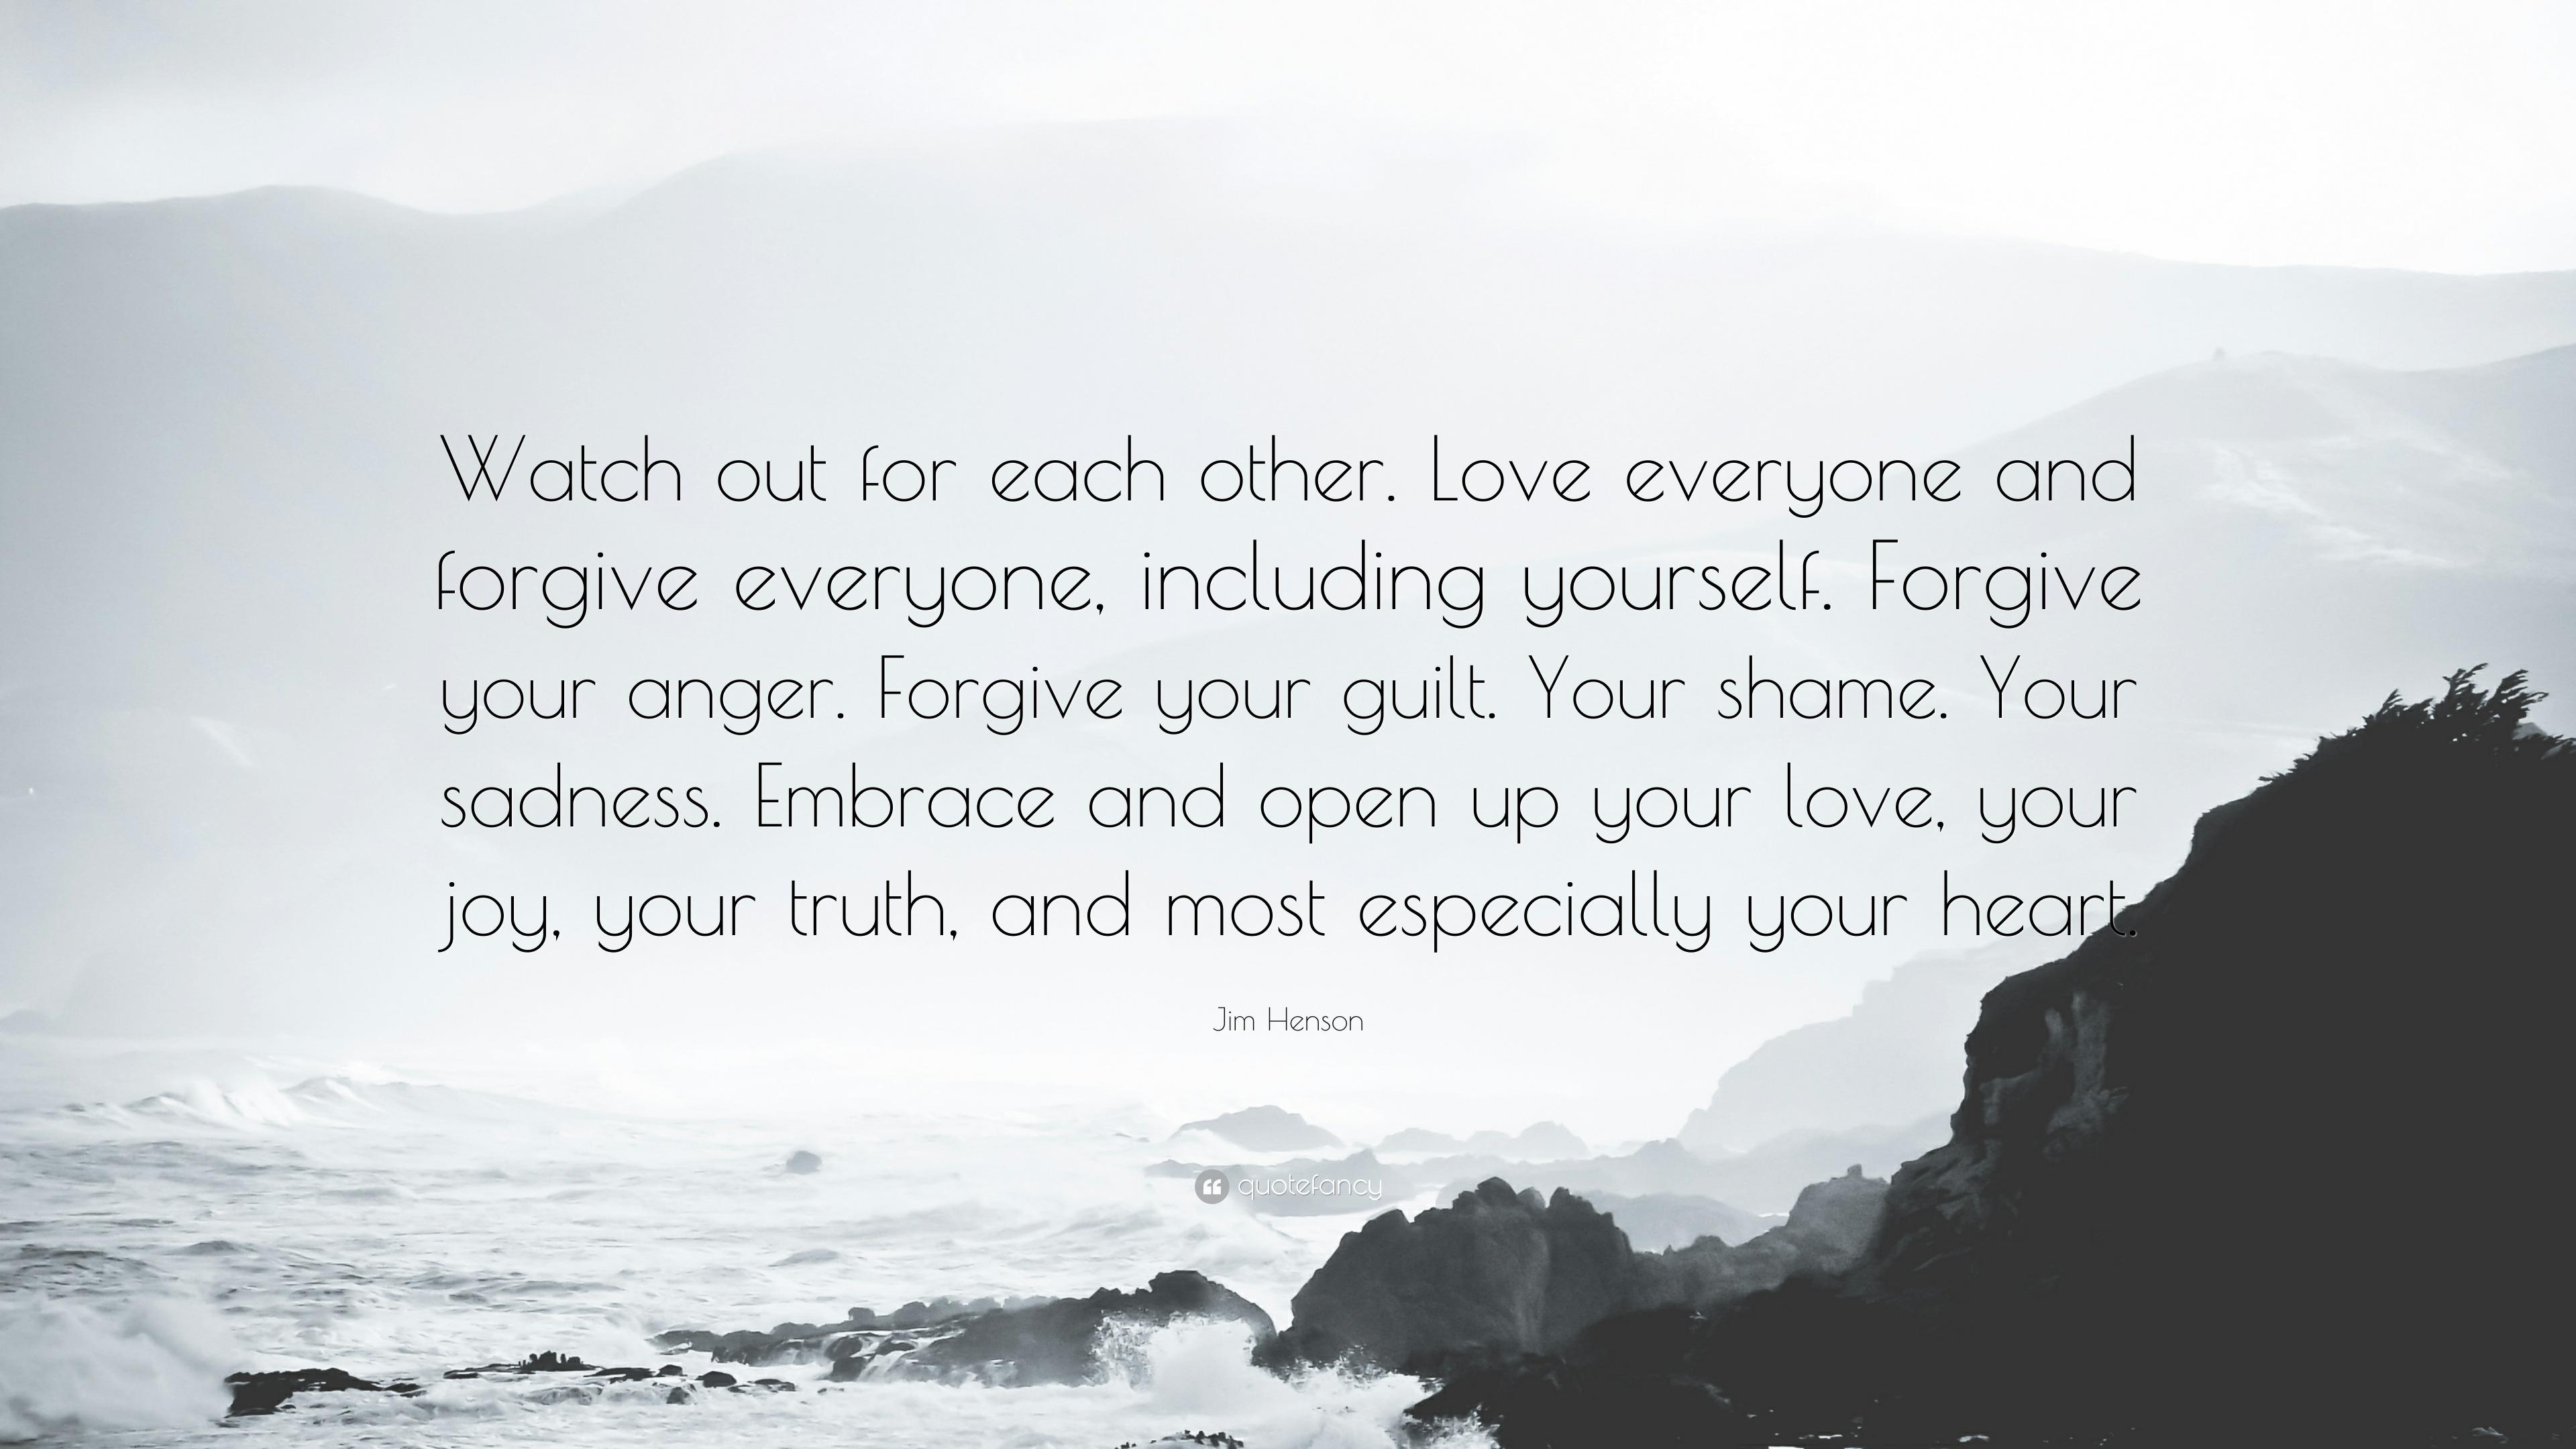 How to forgive everyone 12